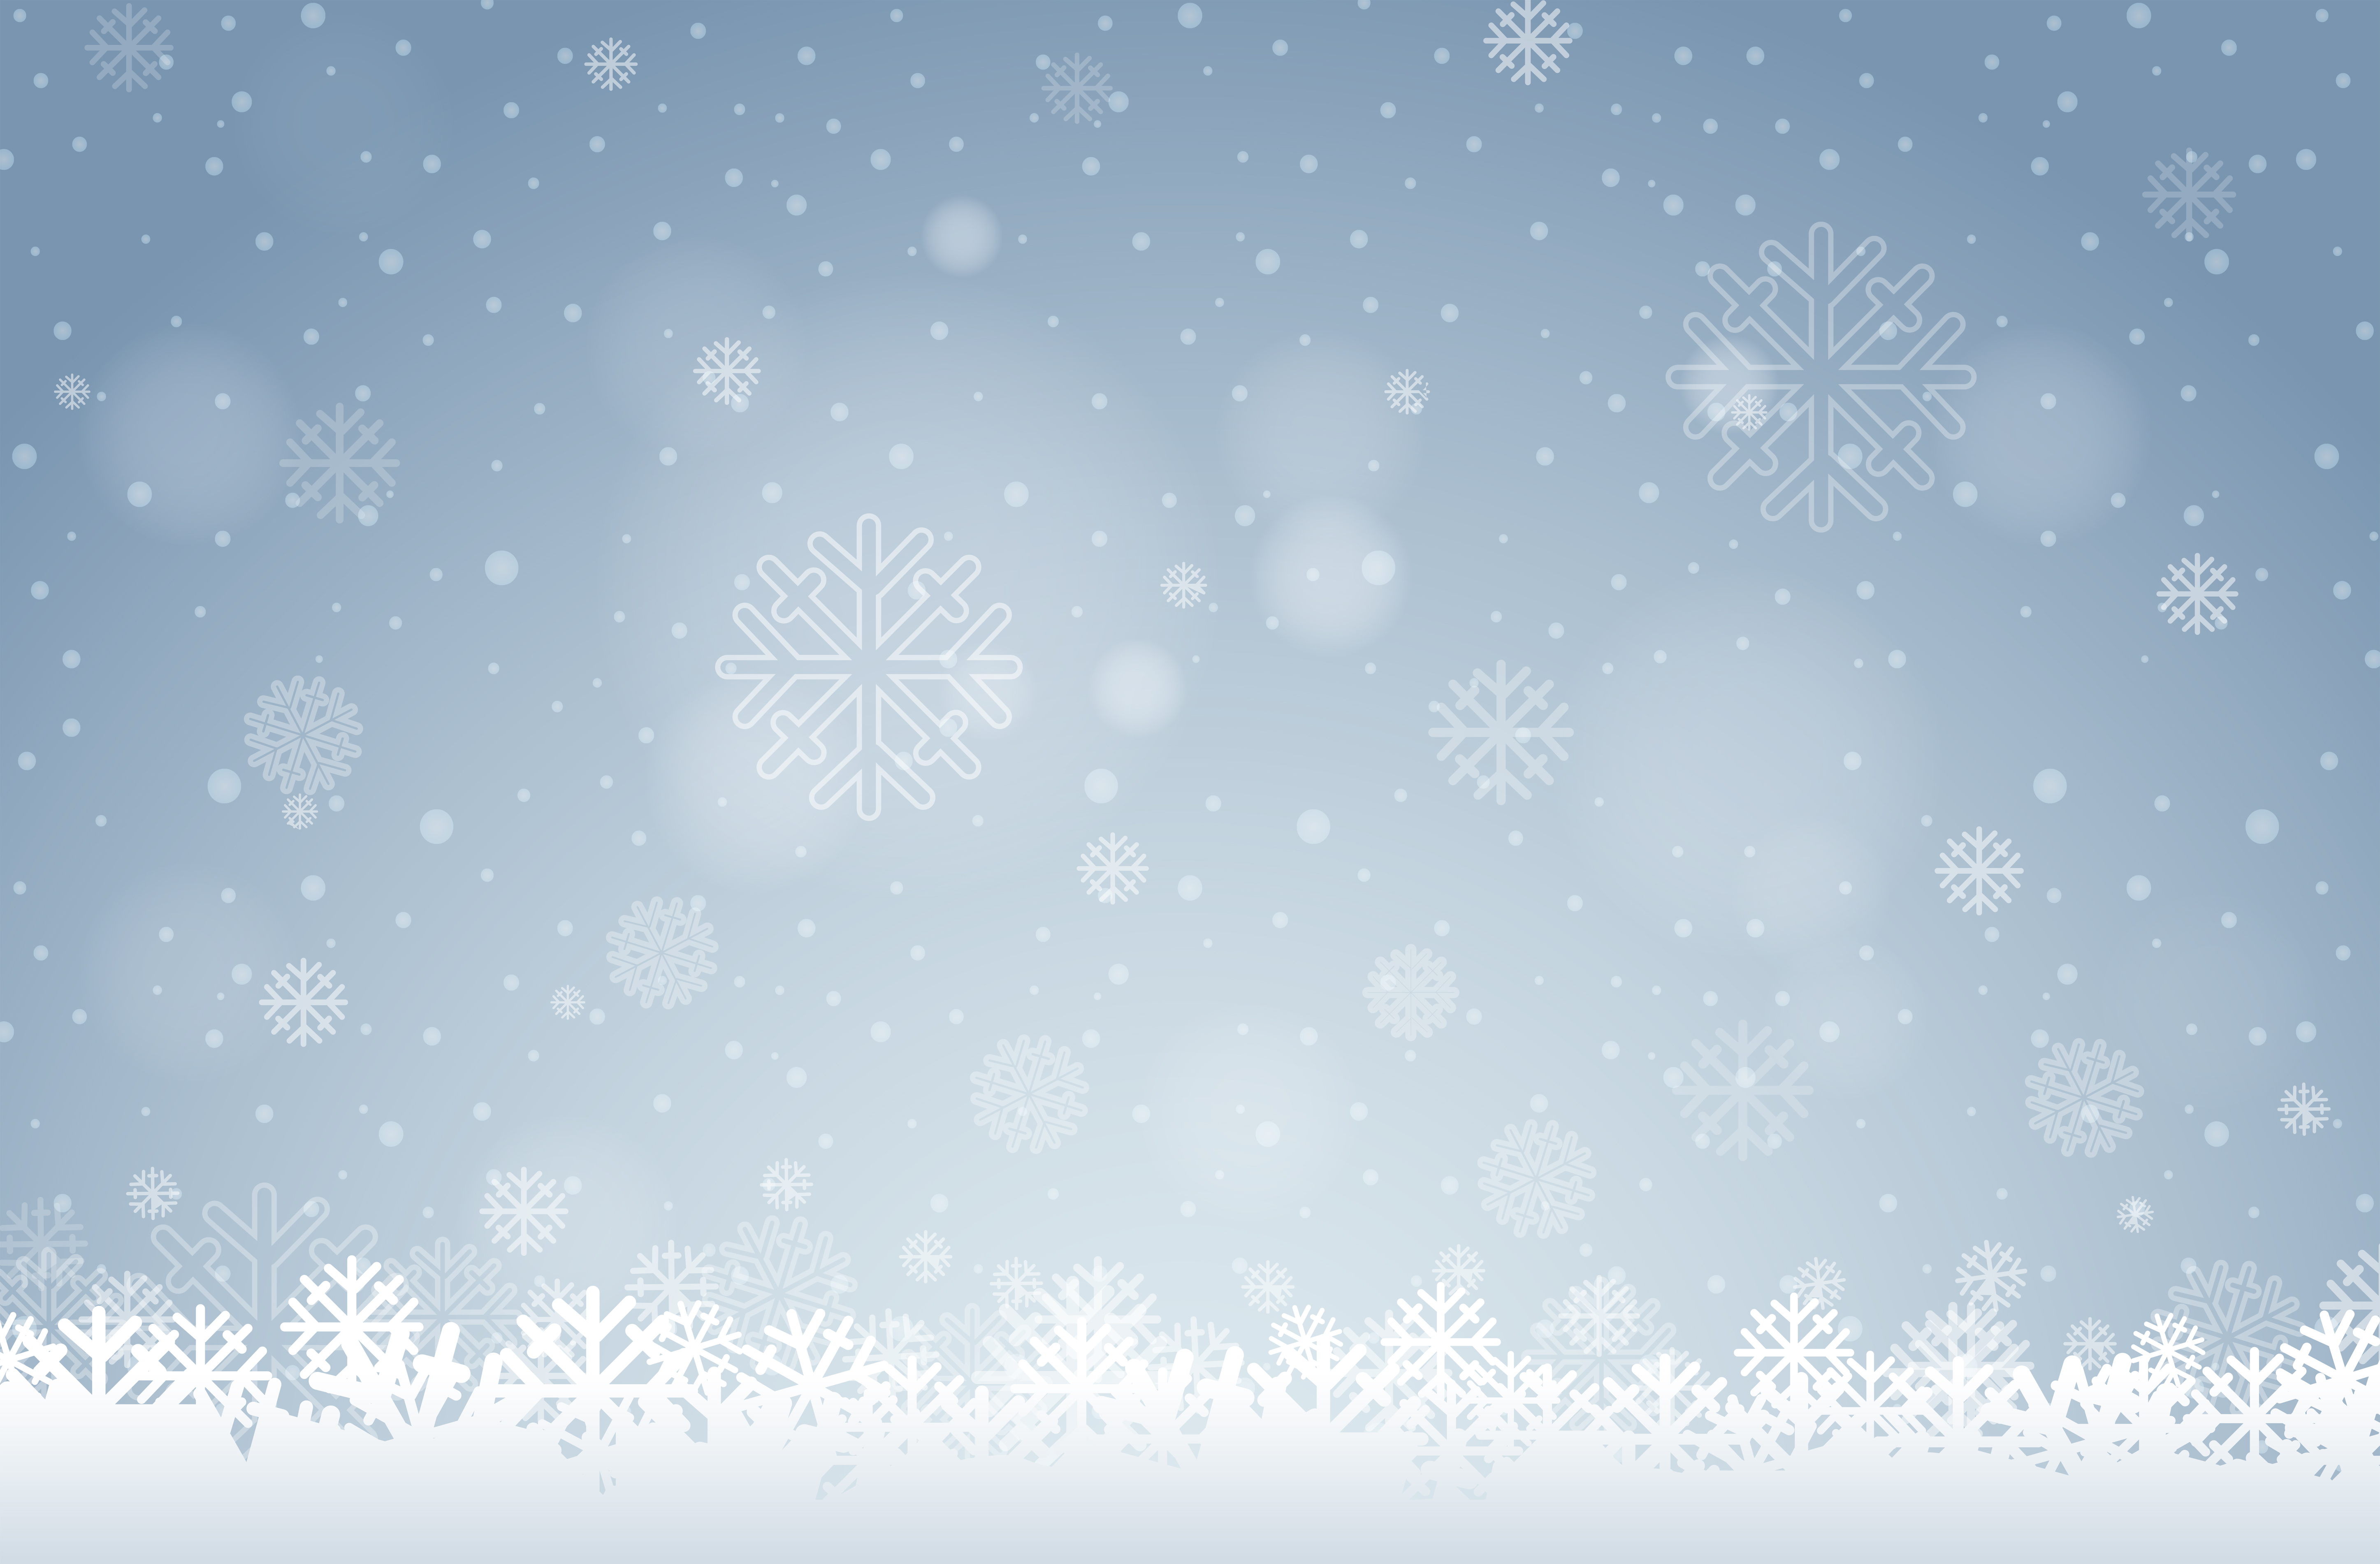 Black and White Snow Wallpaper - WallpaperSafari |White Snowflake Wallpaper